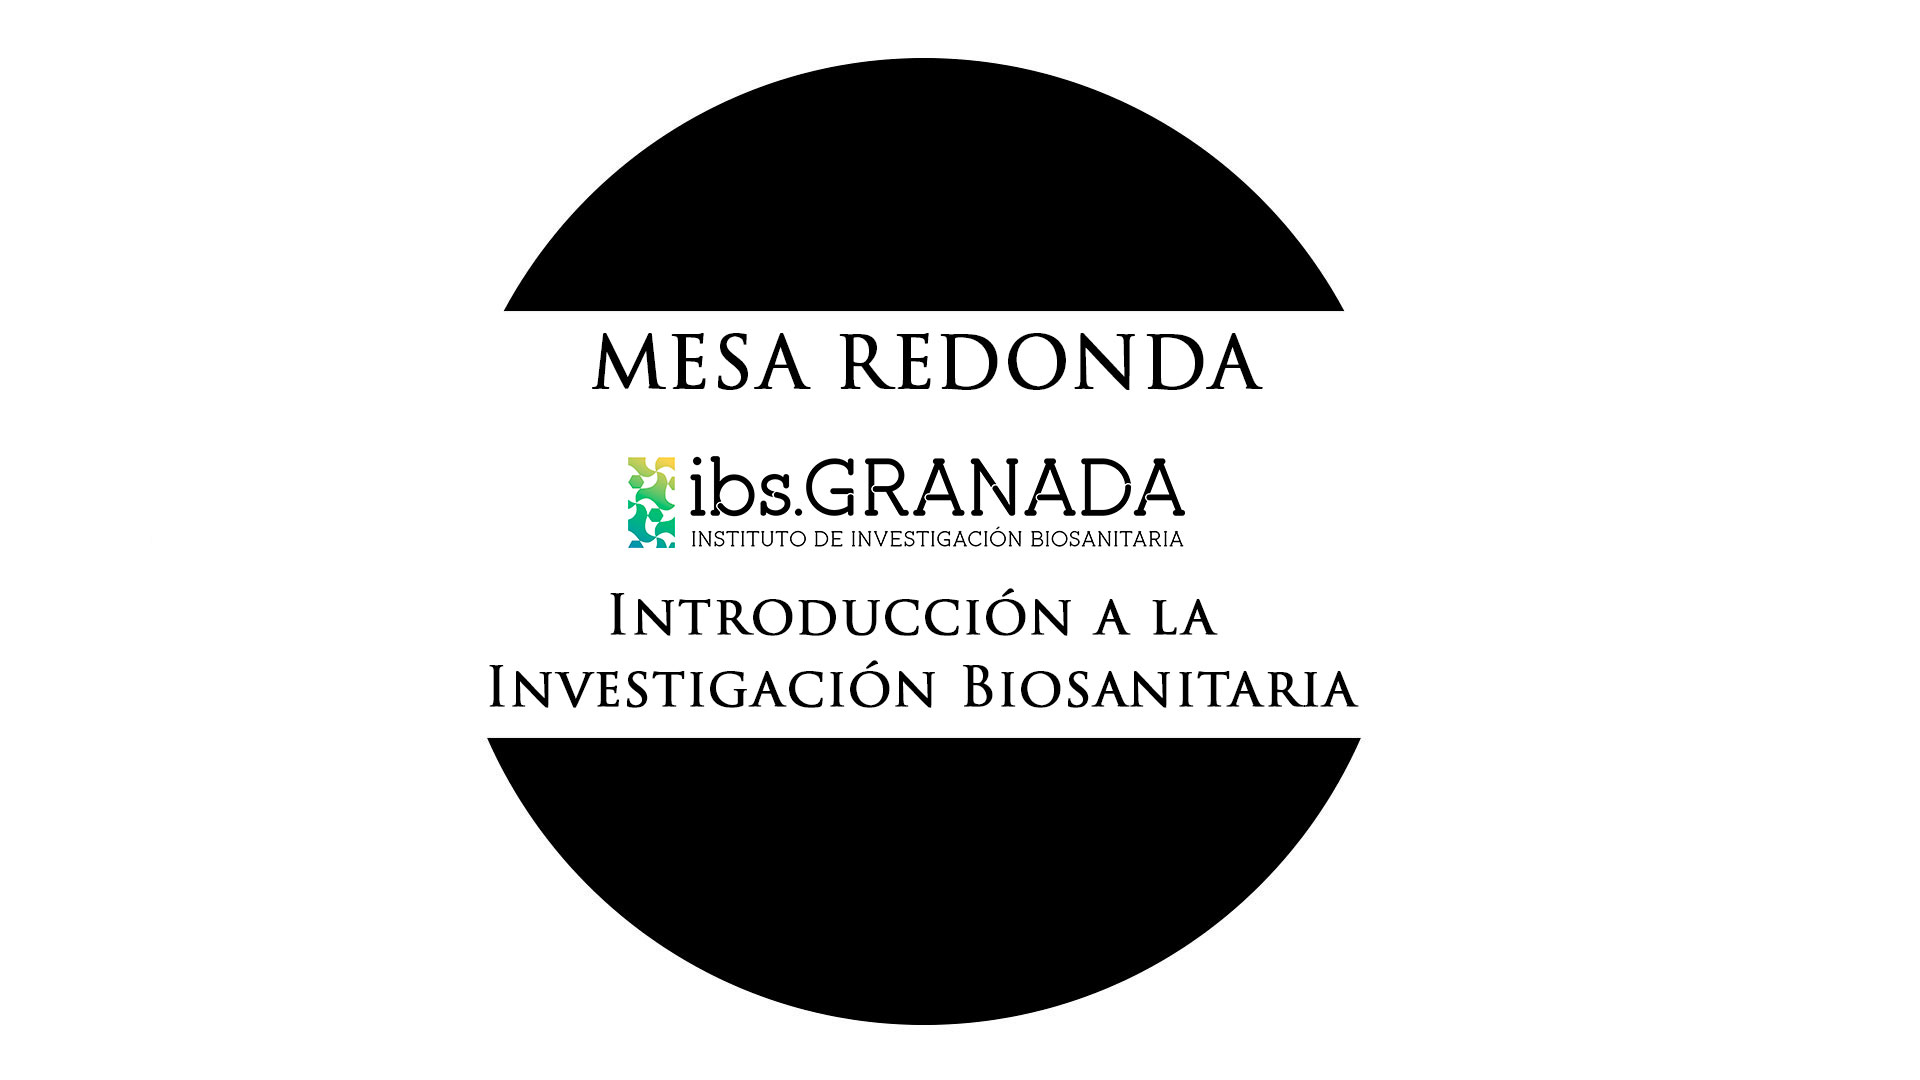 Mesa redonda Introducción a la Investigación Biosanitaria